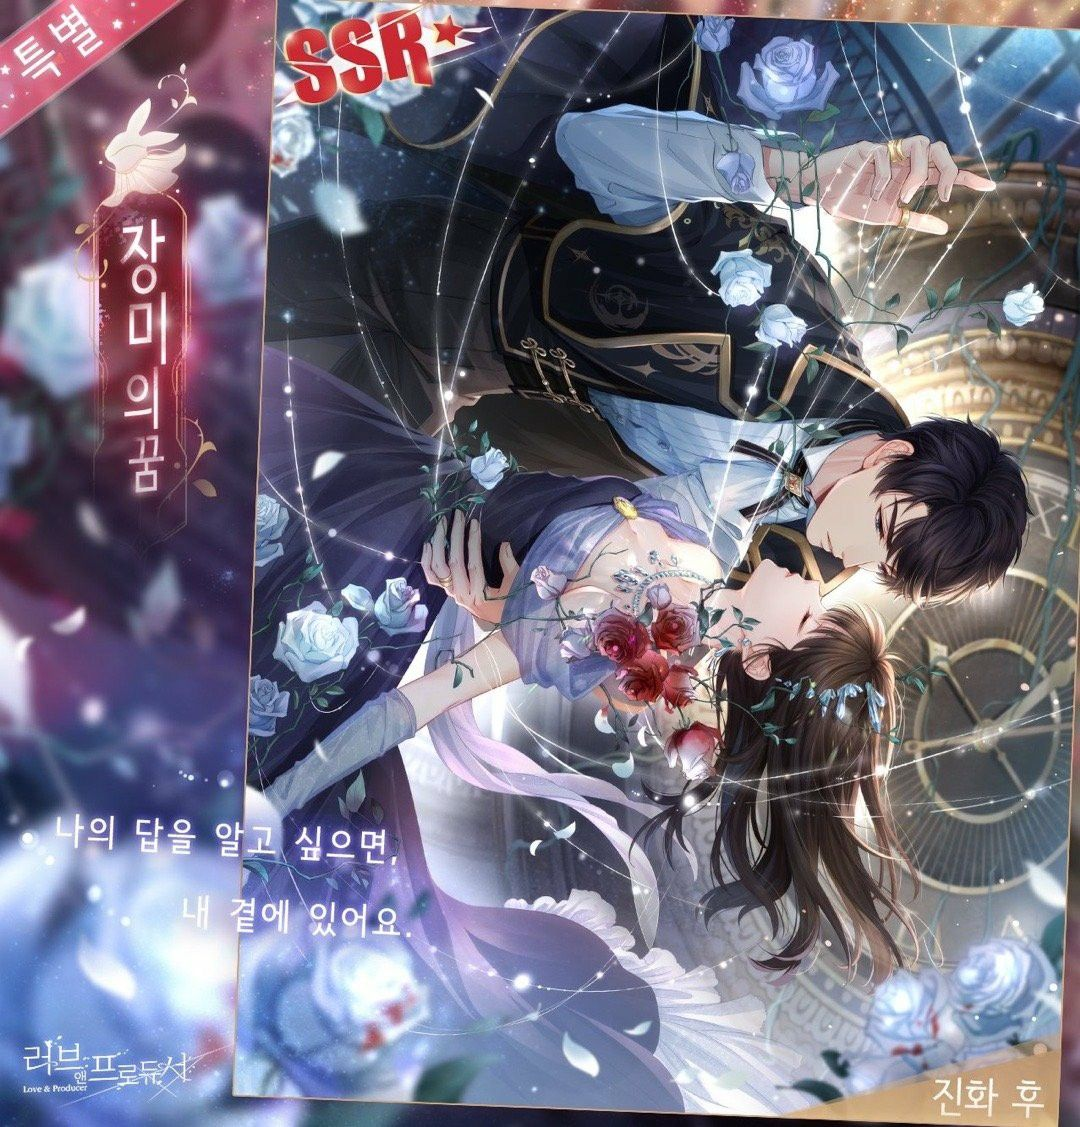 Pin de Difa Nisa em mr love Queen choice em 9  Anime masculino